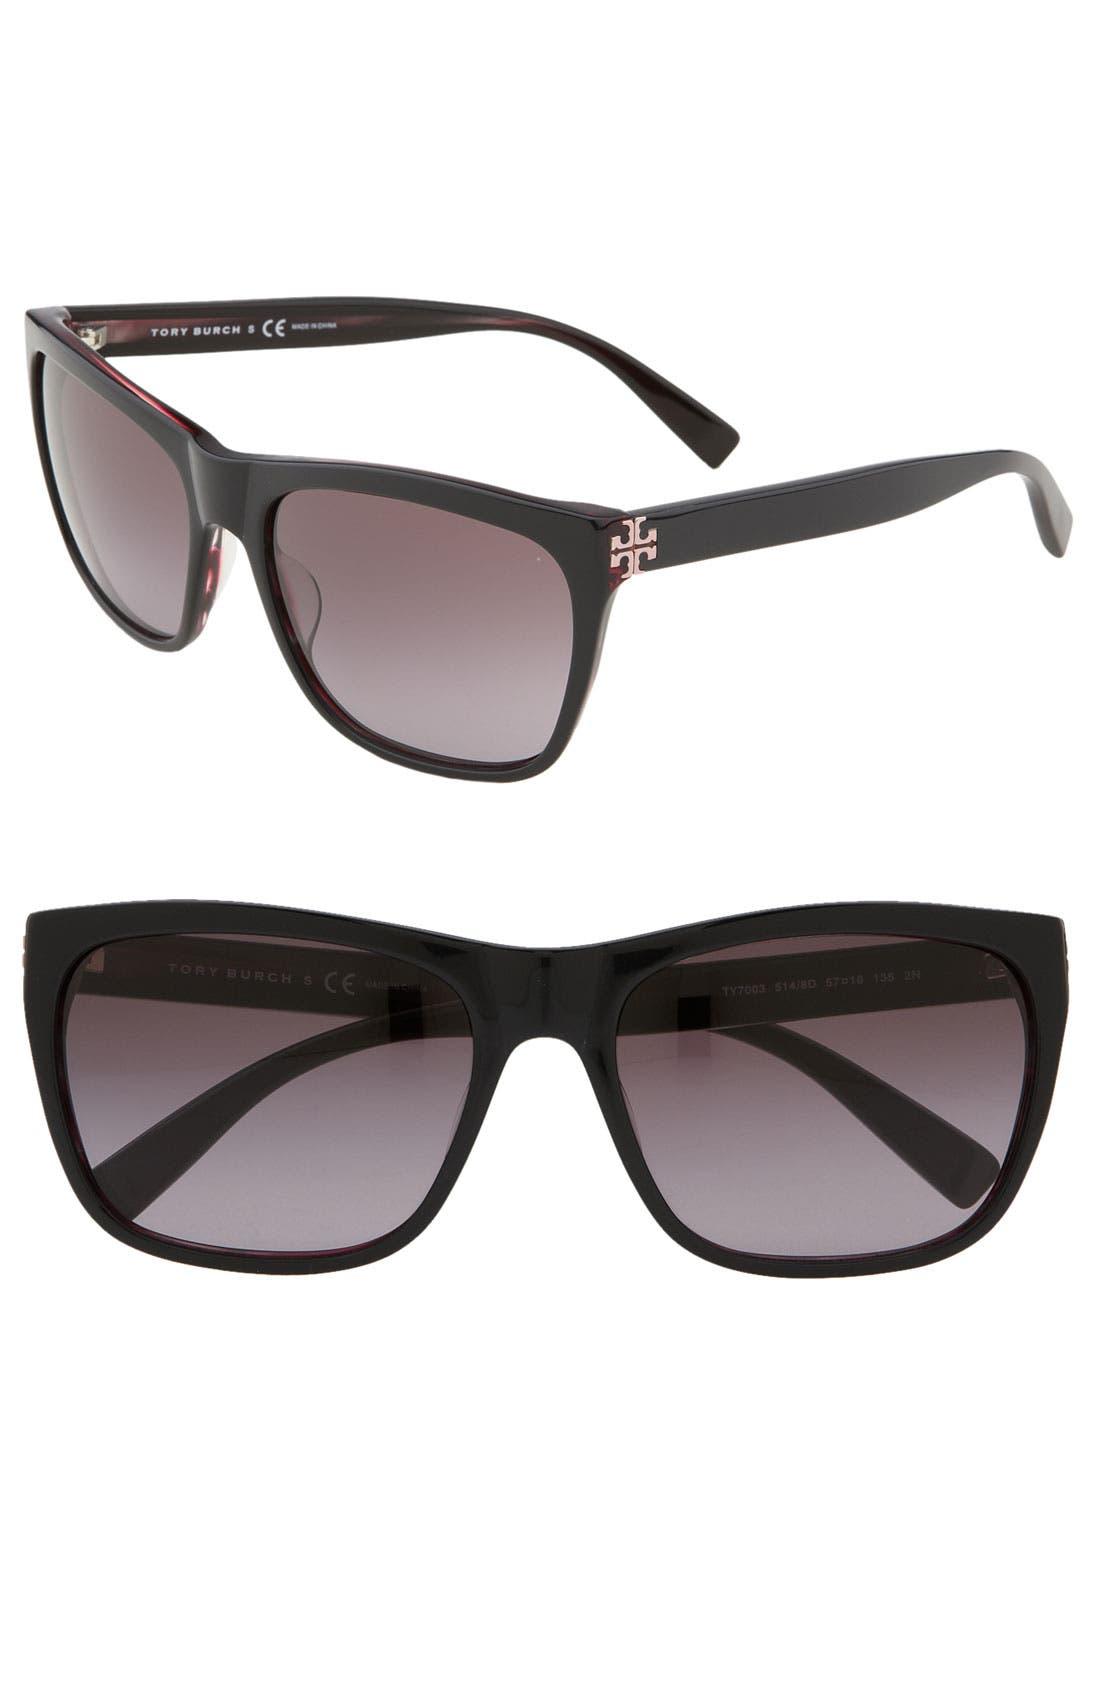 Retro Inspired 57mm Square Sunglasses,                             Main thumbnail 1, color,                             020